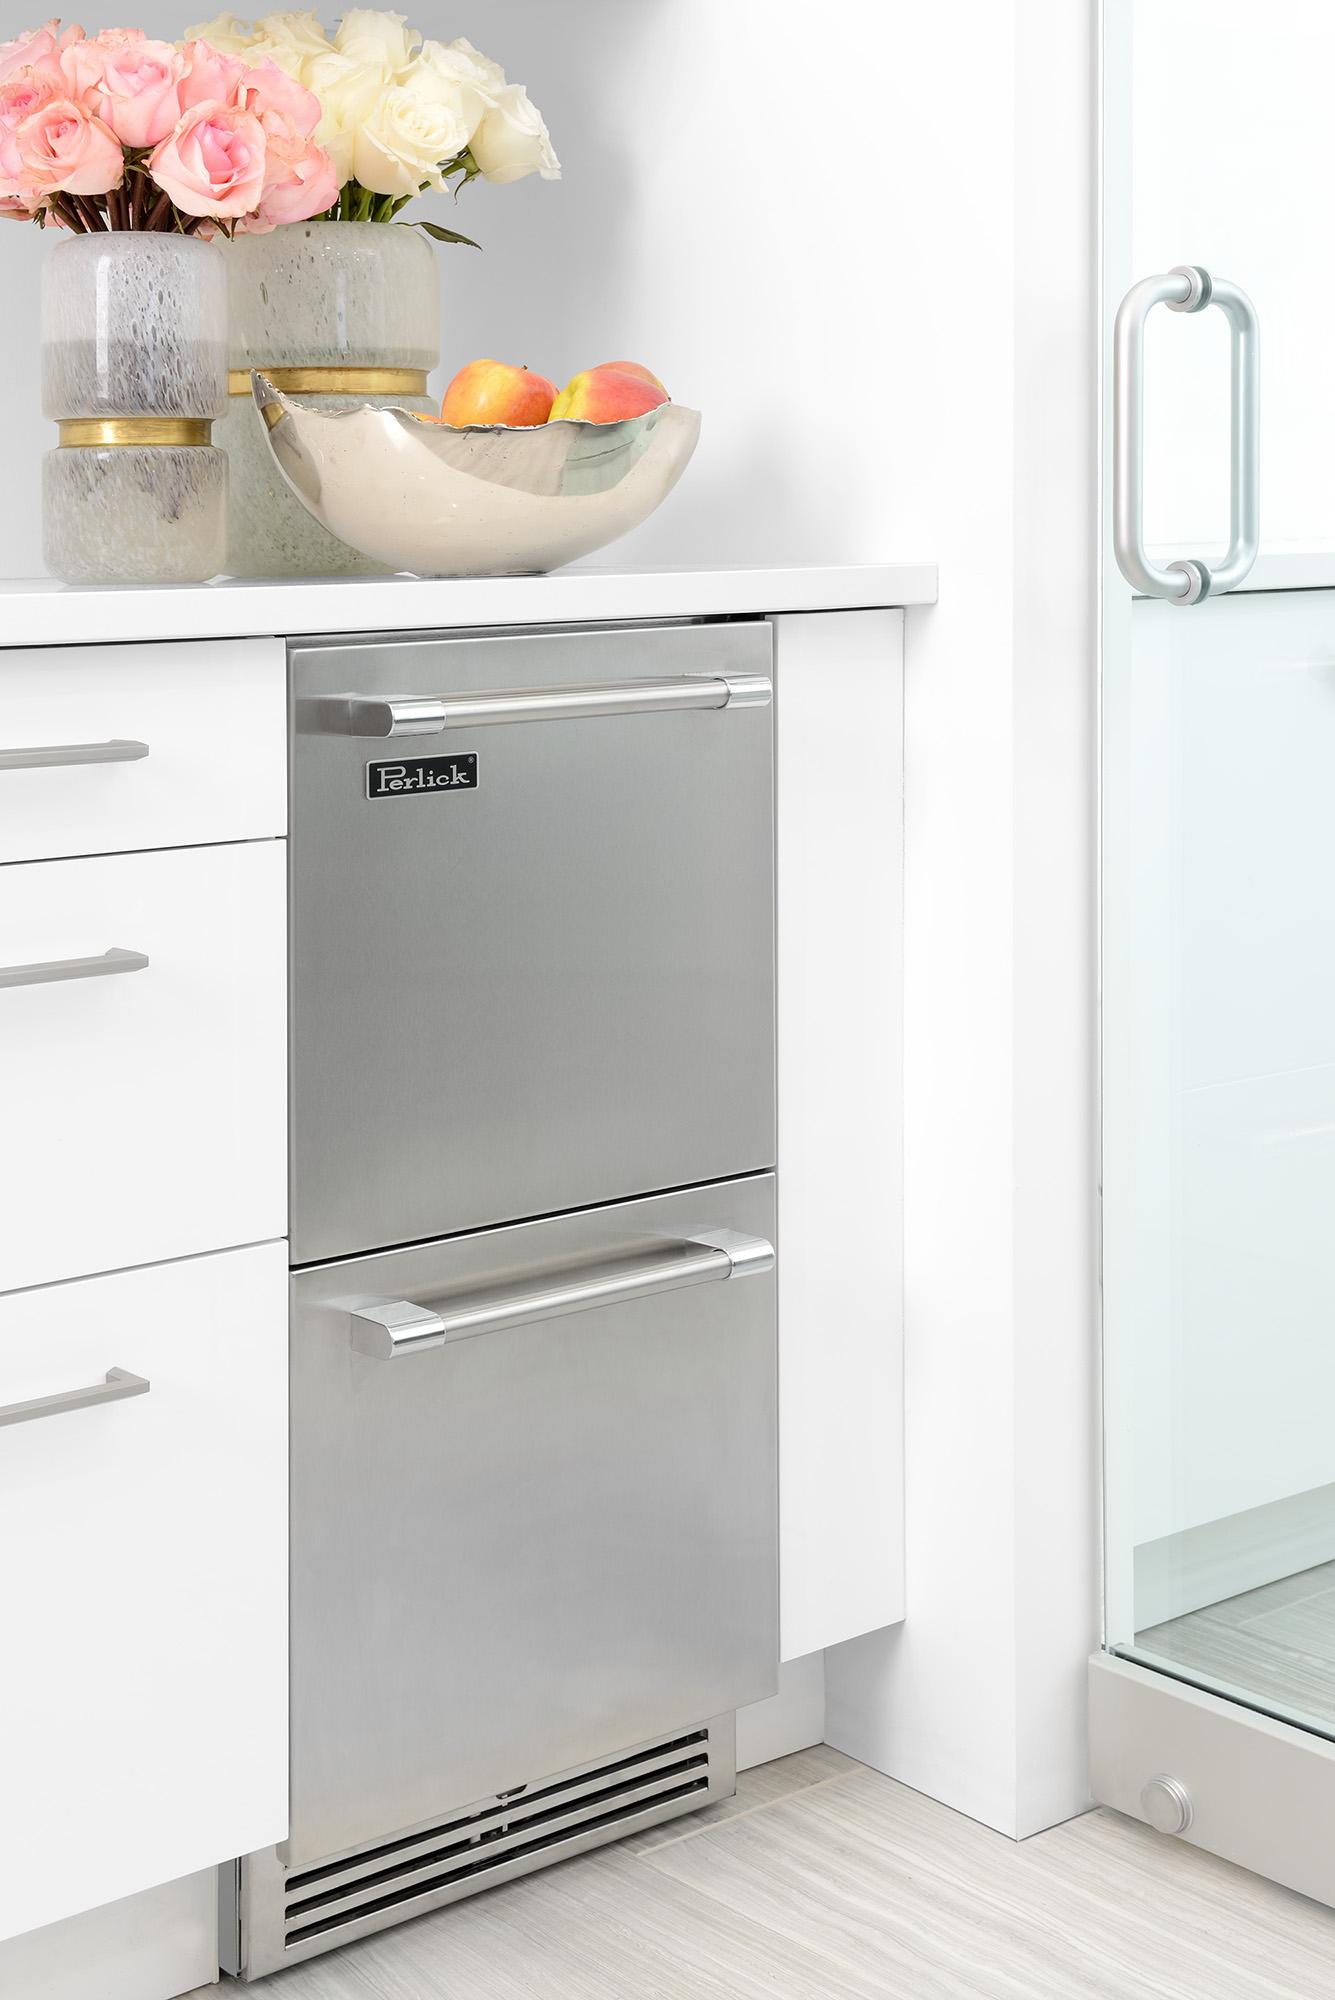 docere-perlick-fridge-drawers